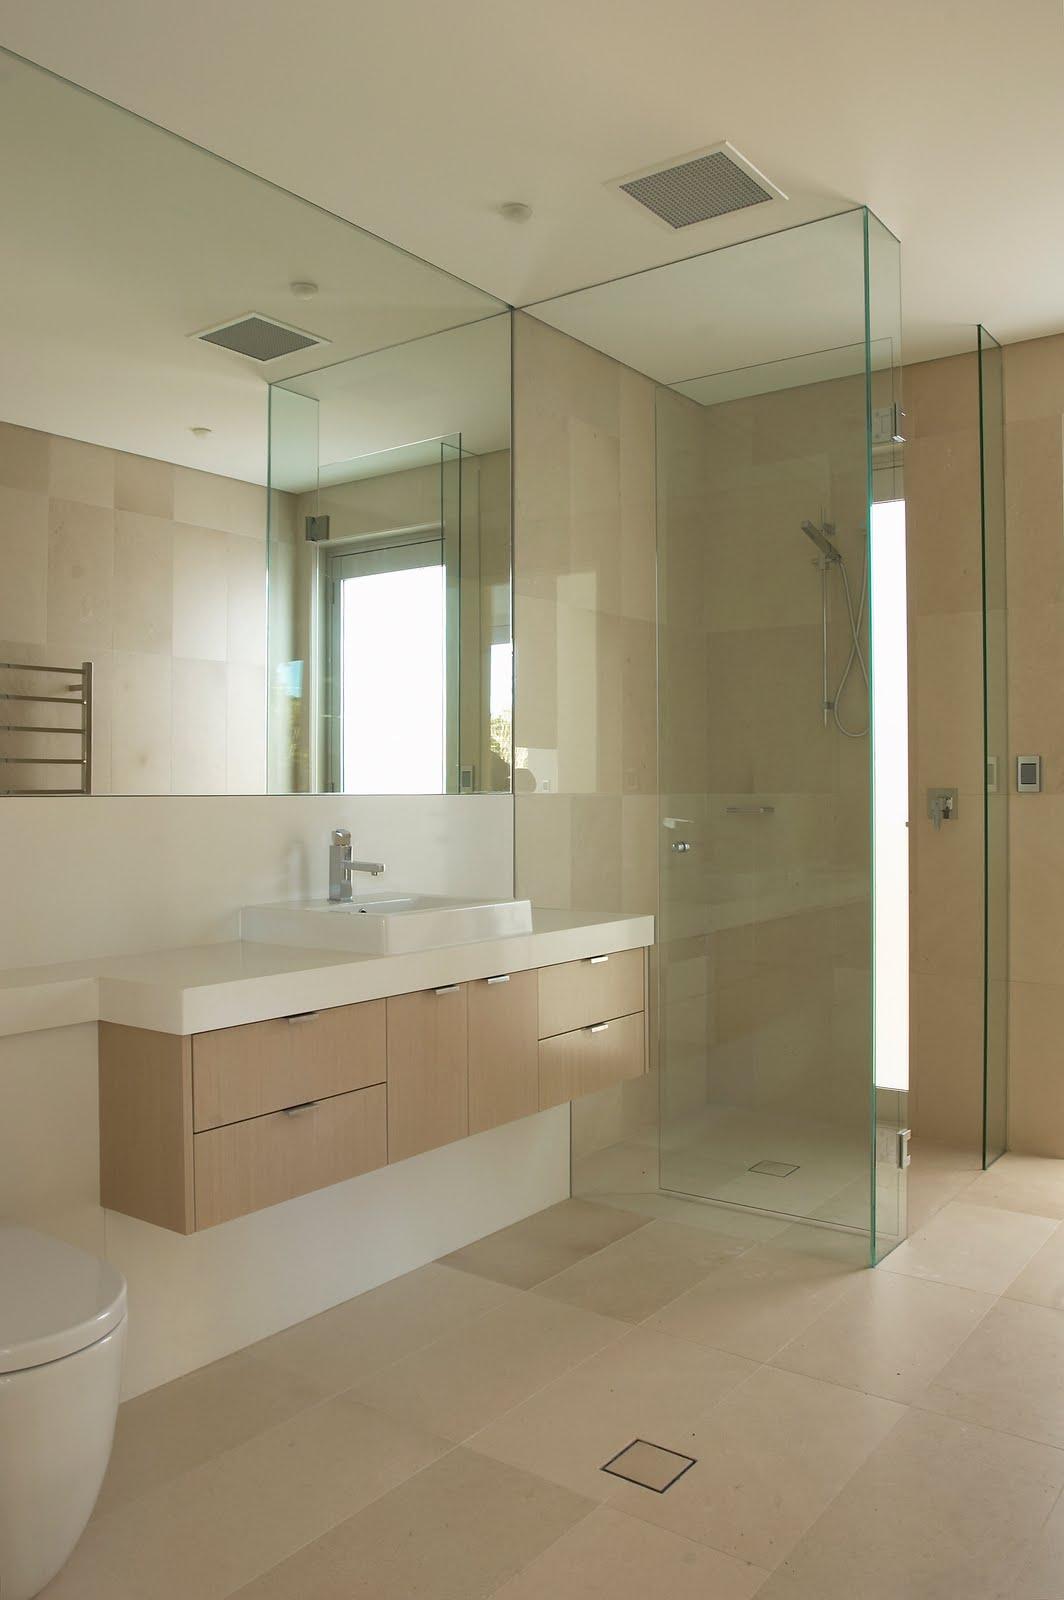 2 Beautifully Simple Limestone Bathrooms Byzantine Design